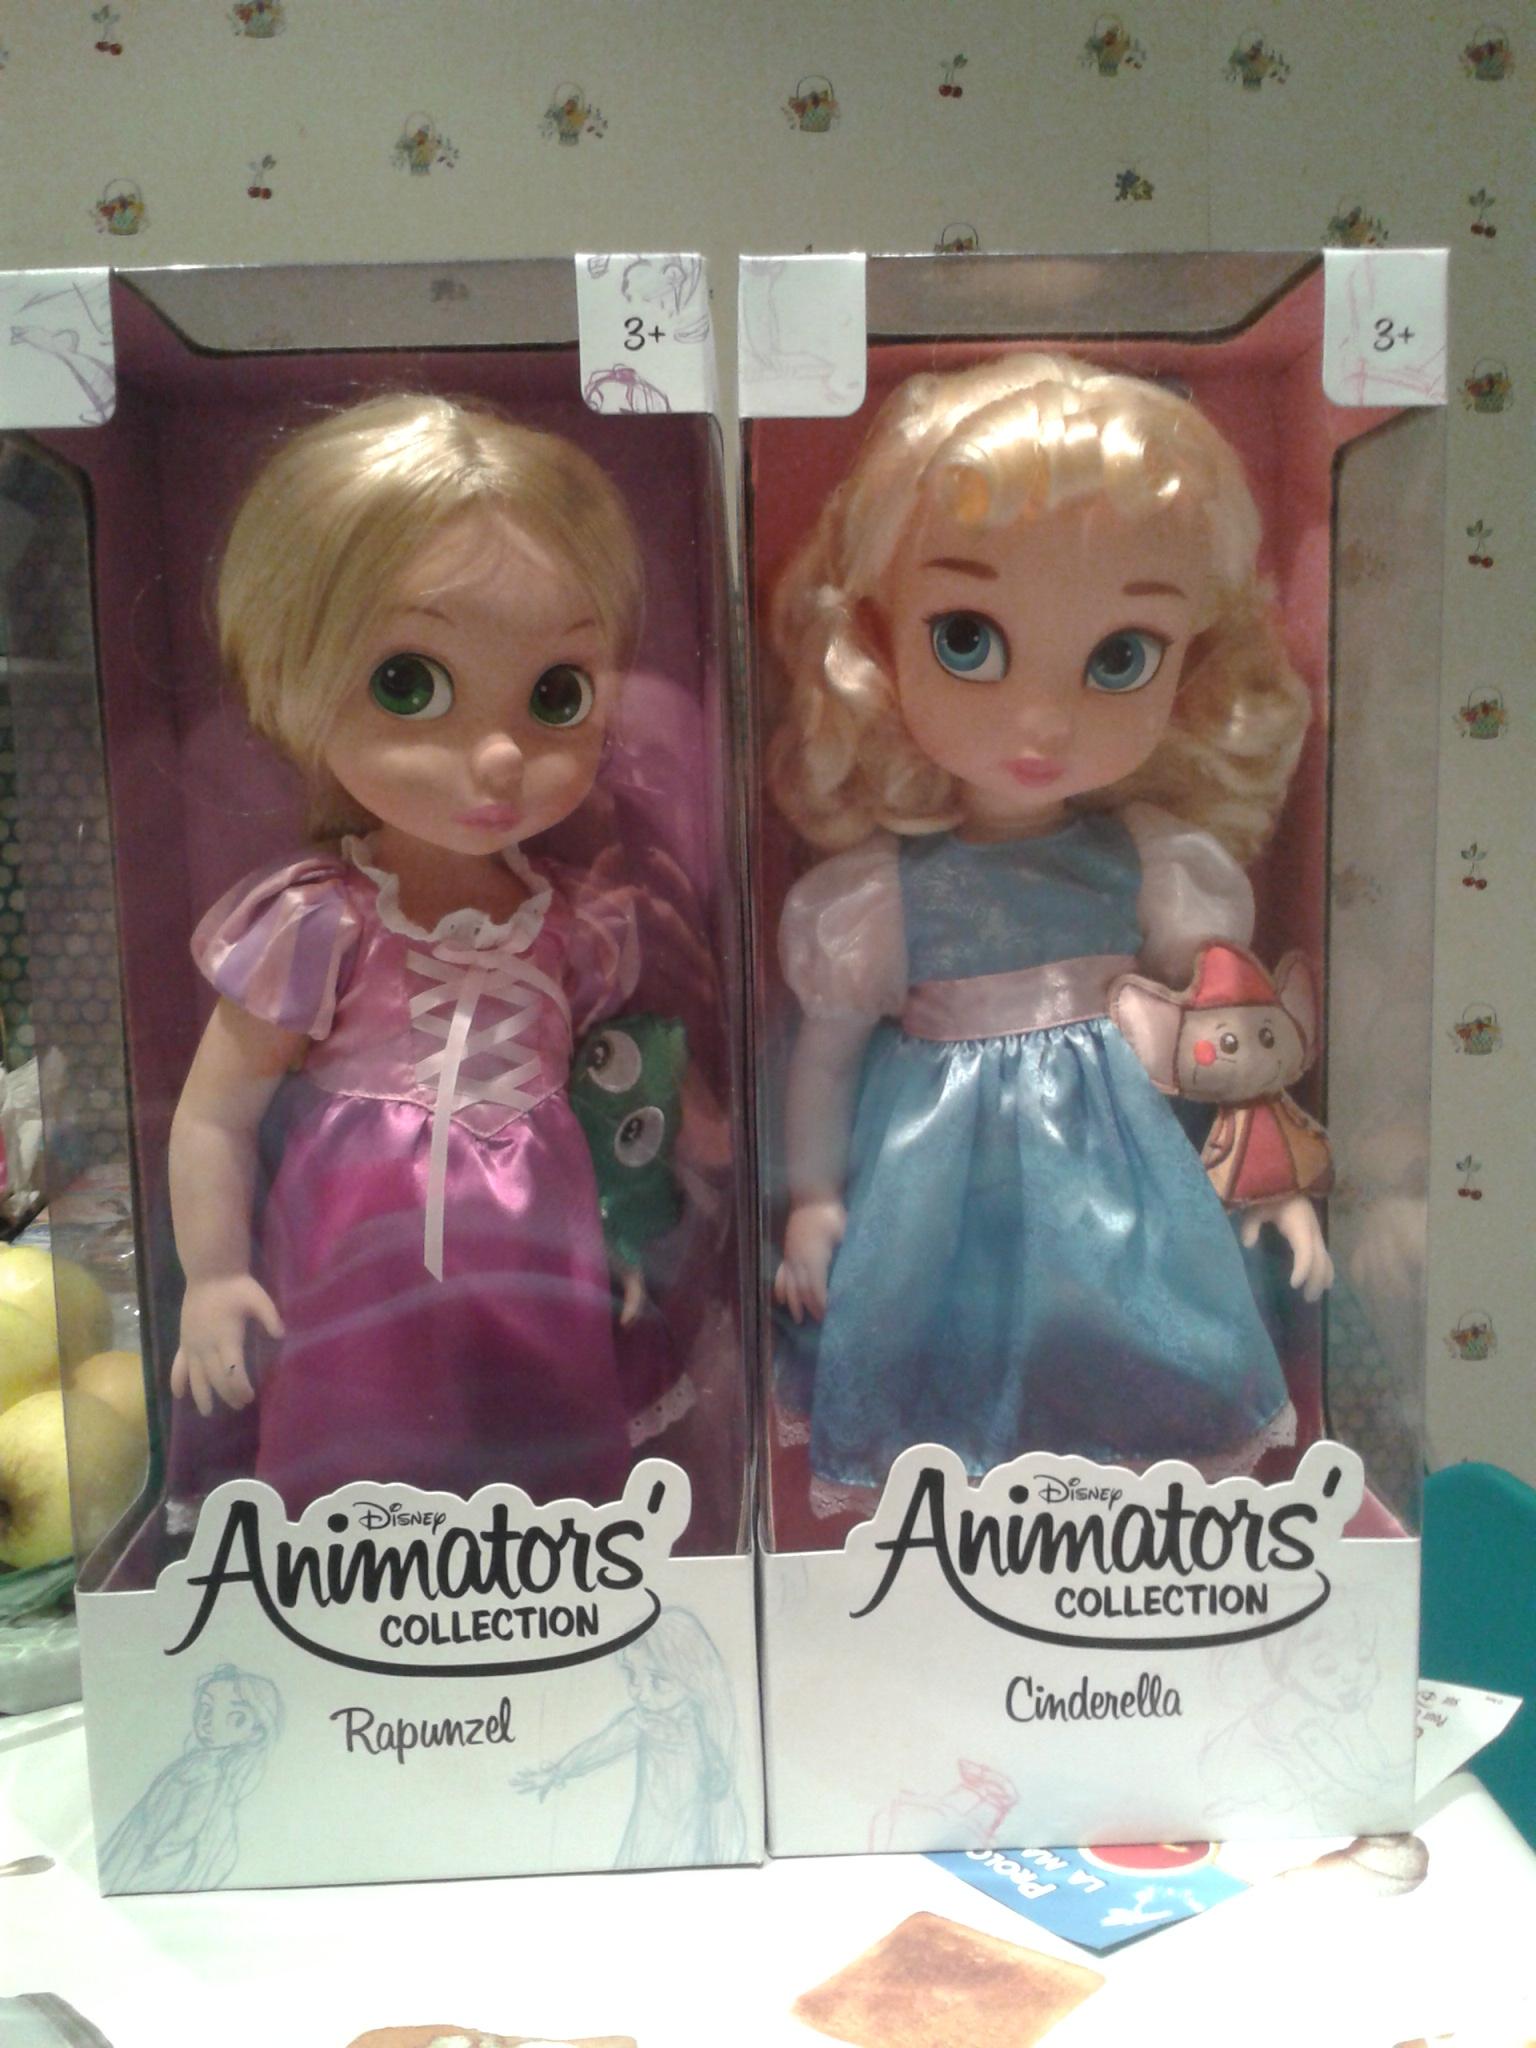 Disney Animator's Collection (depuis 2011) 89350420121114184819